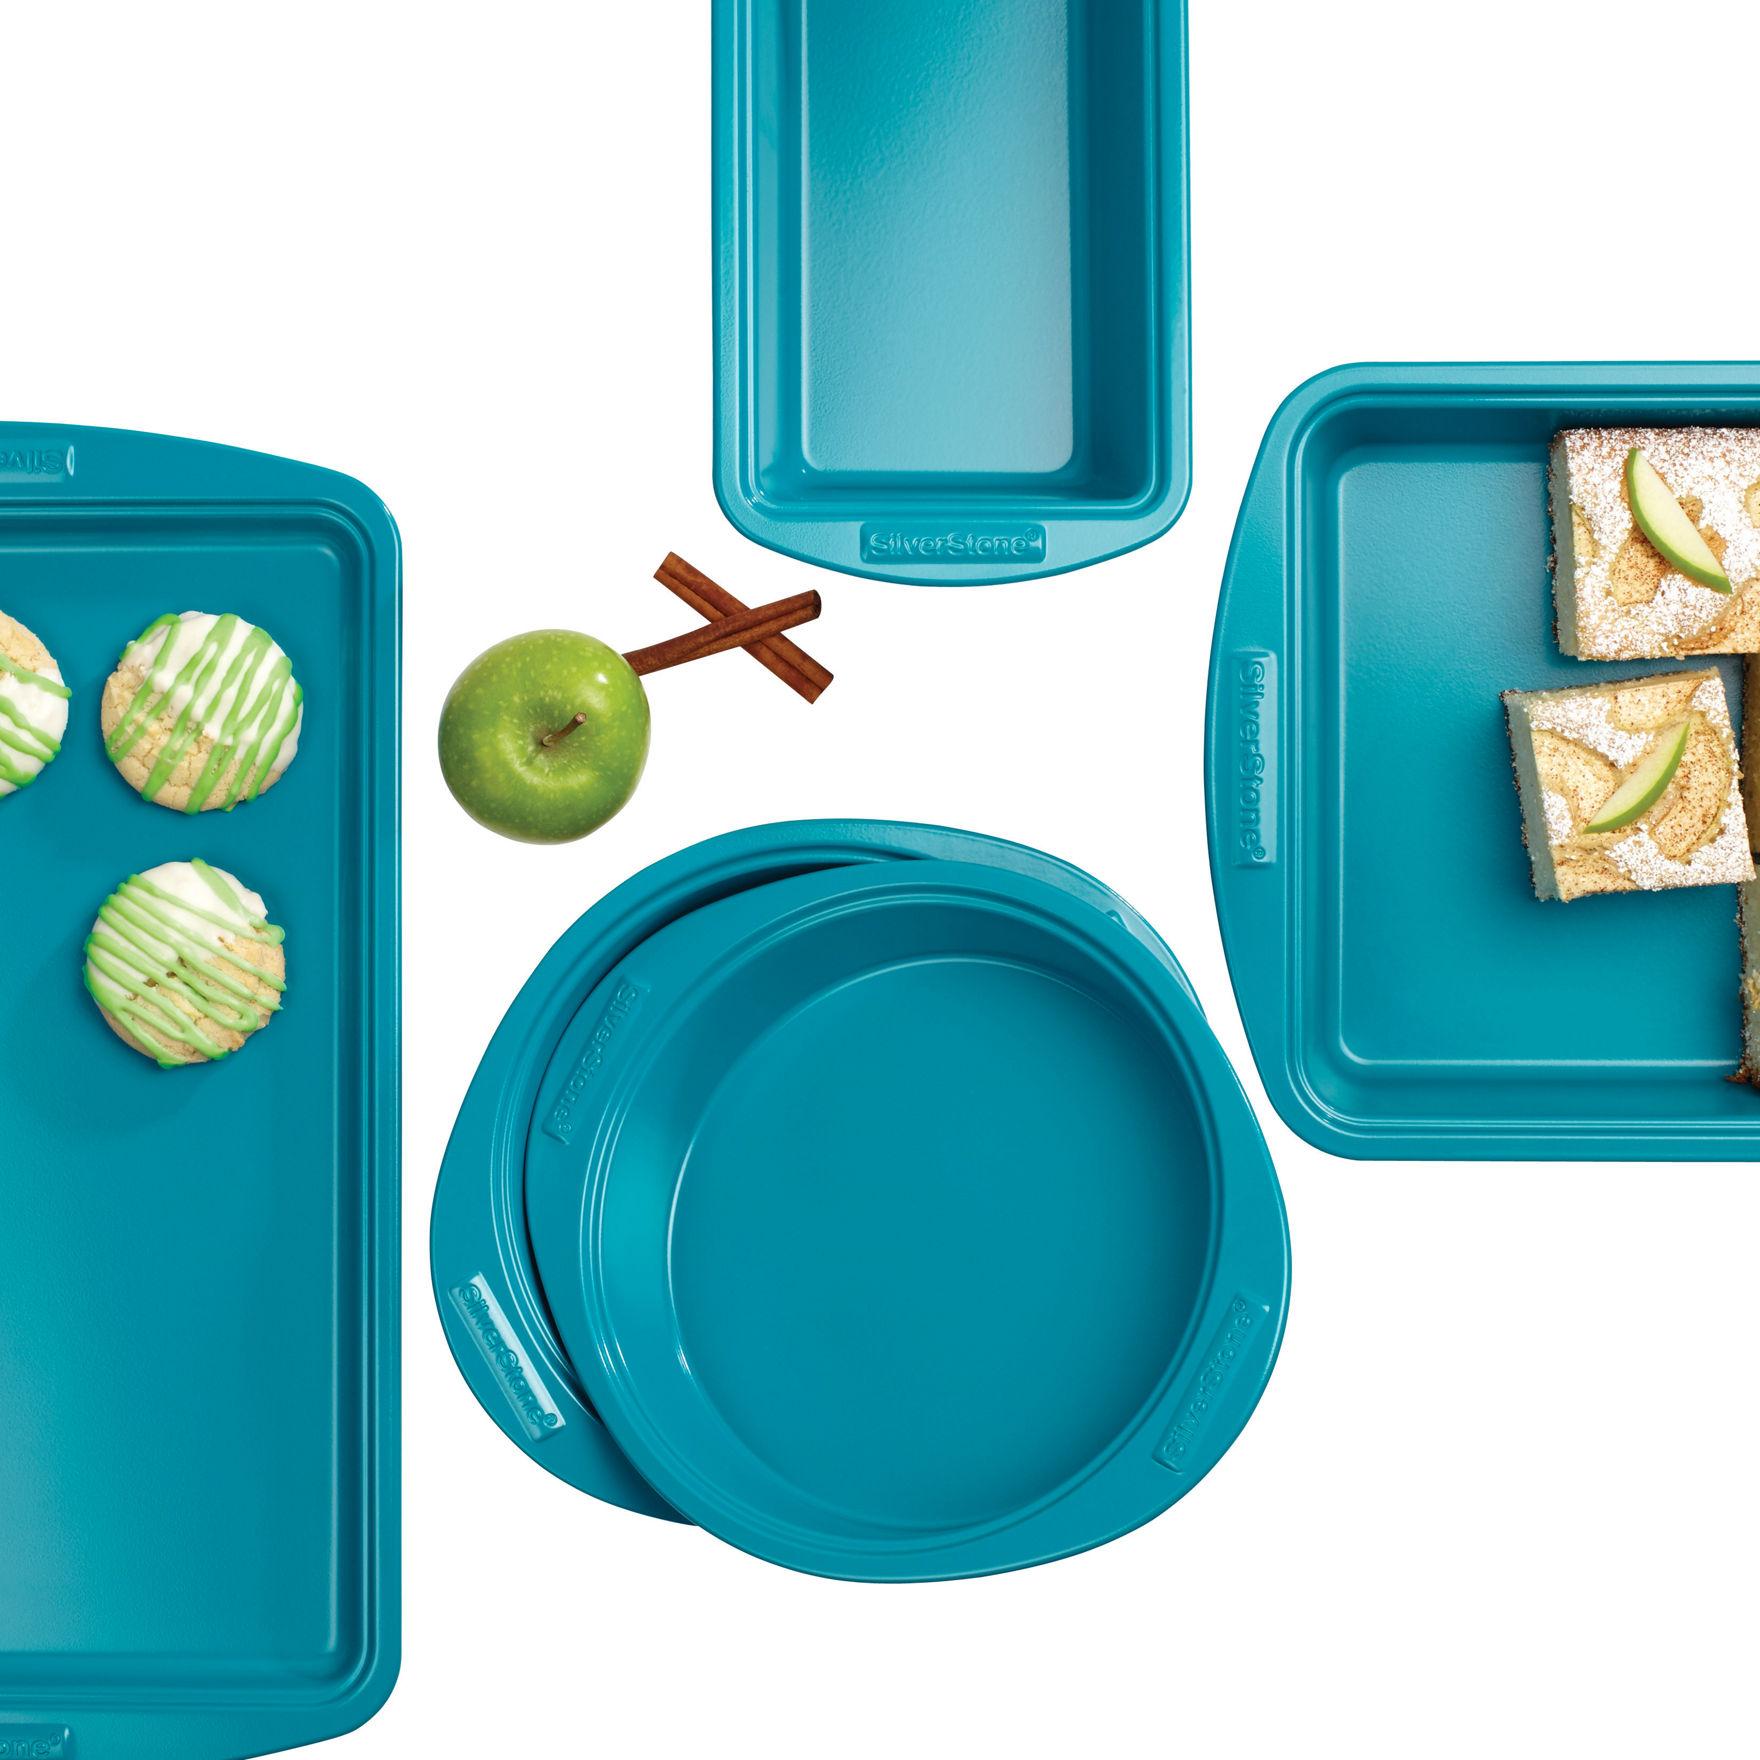 Silverstone Blue Cookware Sets Cookware